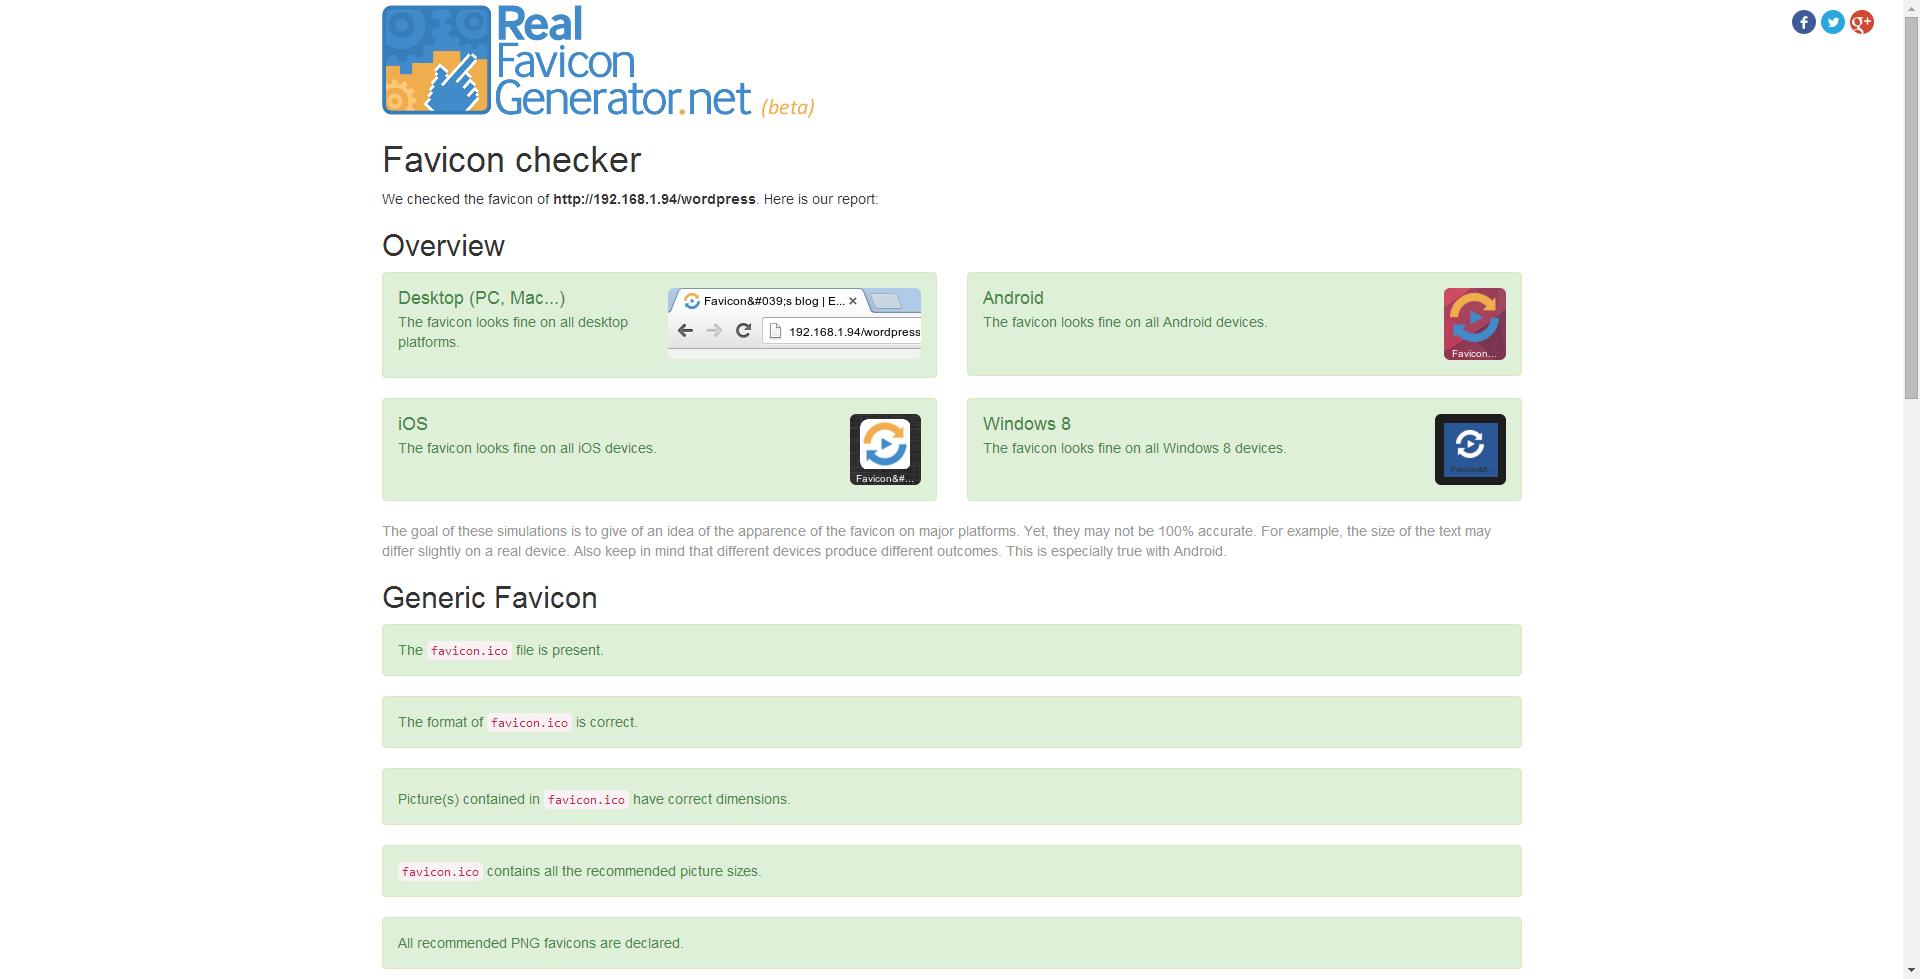 You can also trigger RealFaviconGenerator's favicon checker, to make sure your favicon is correctly setup.